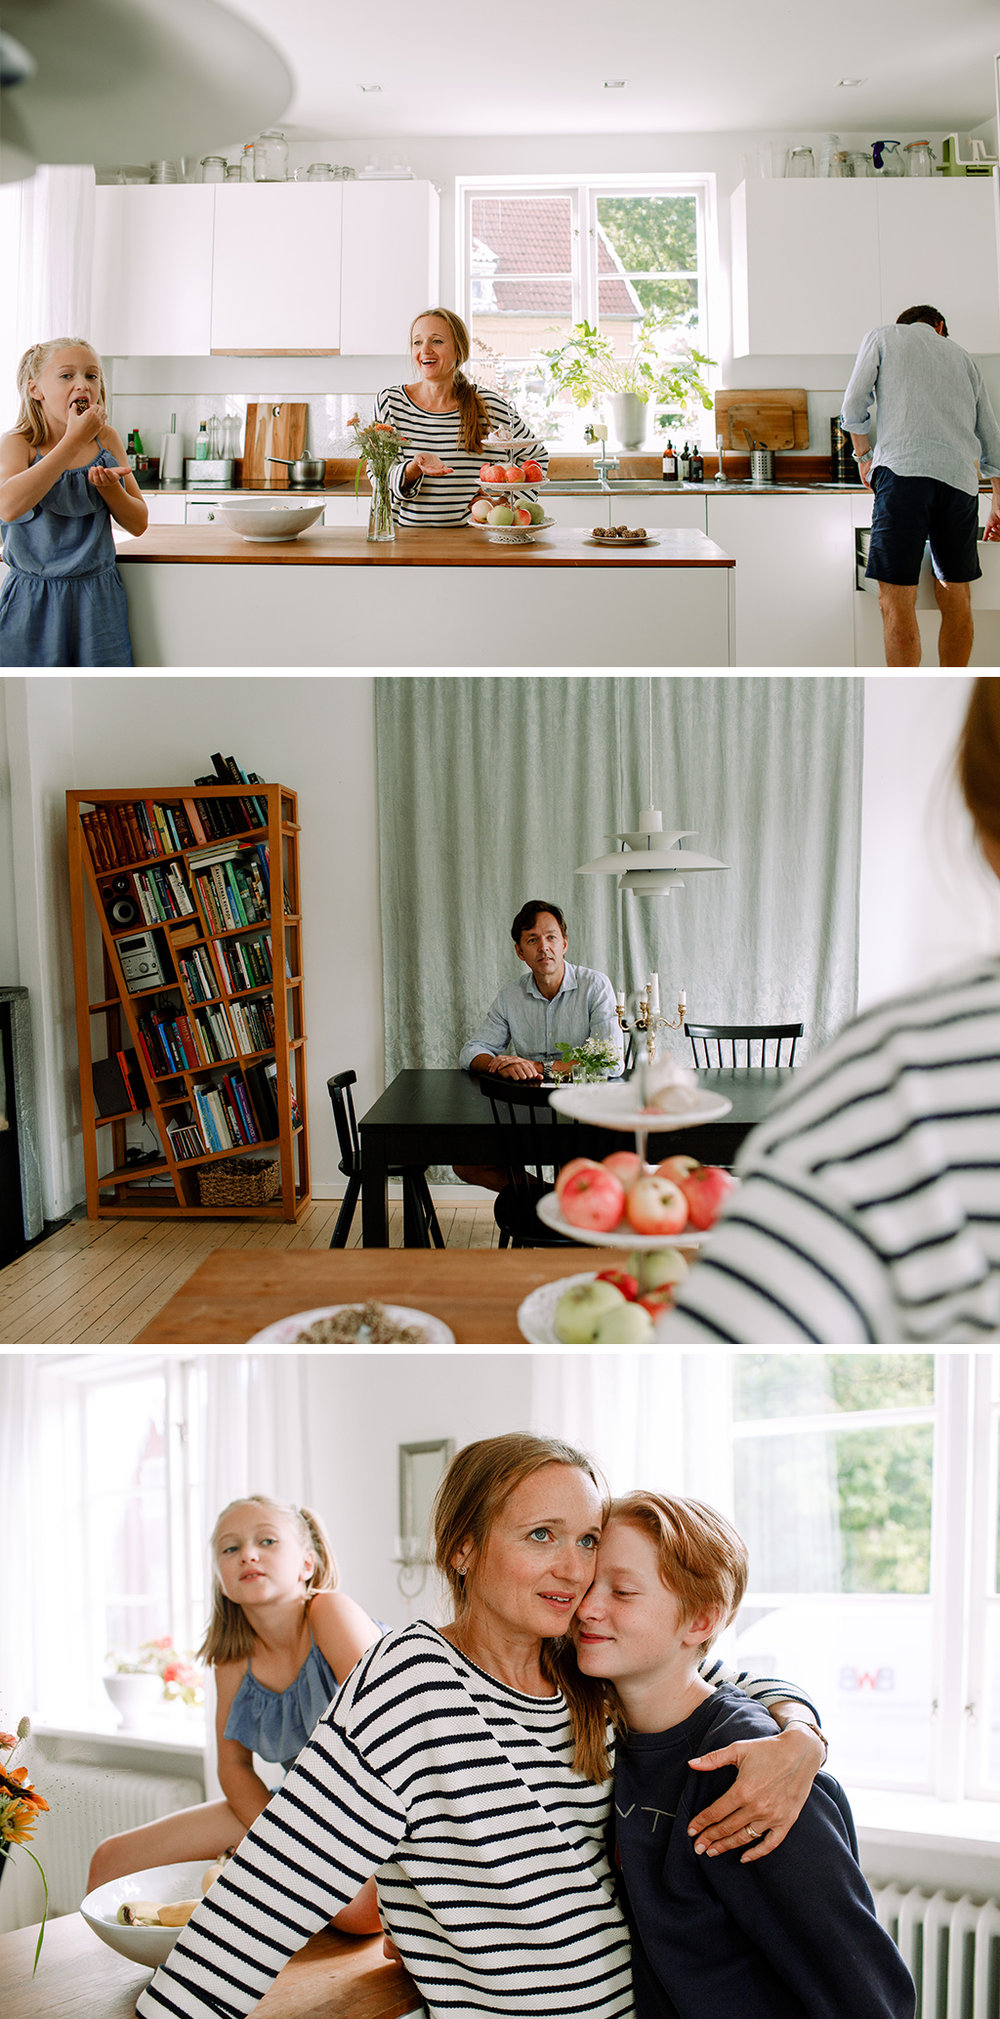 Hemmahosfotografering_Lifestyle_familjefotograf_Stockholm_7.jpg